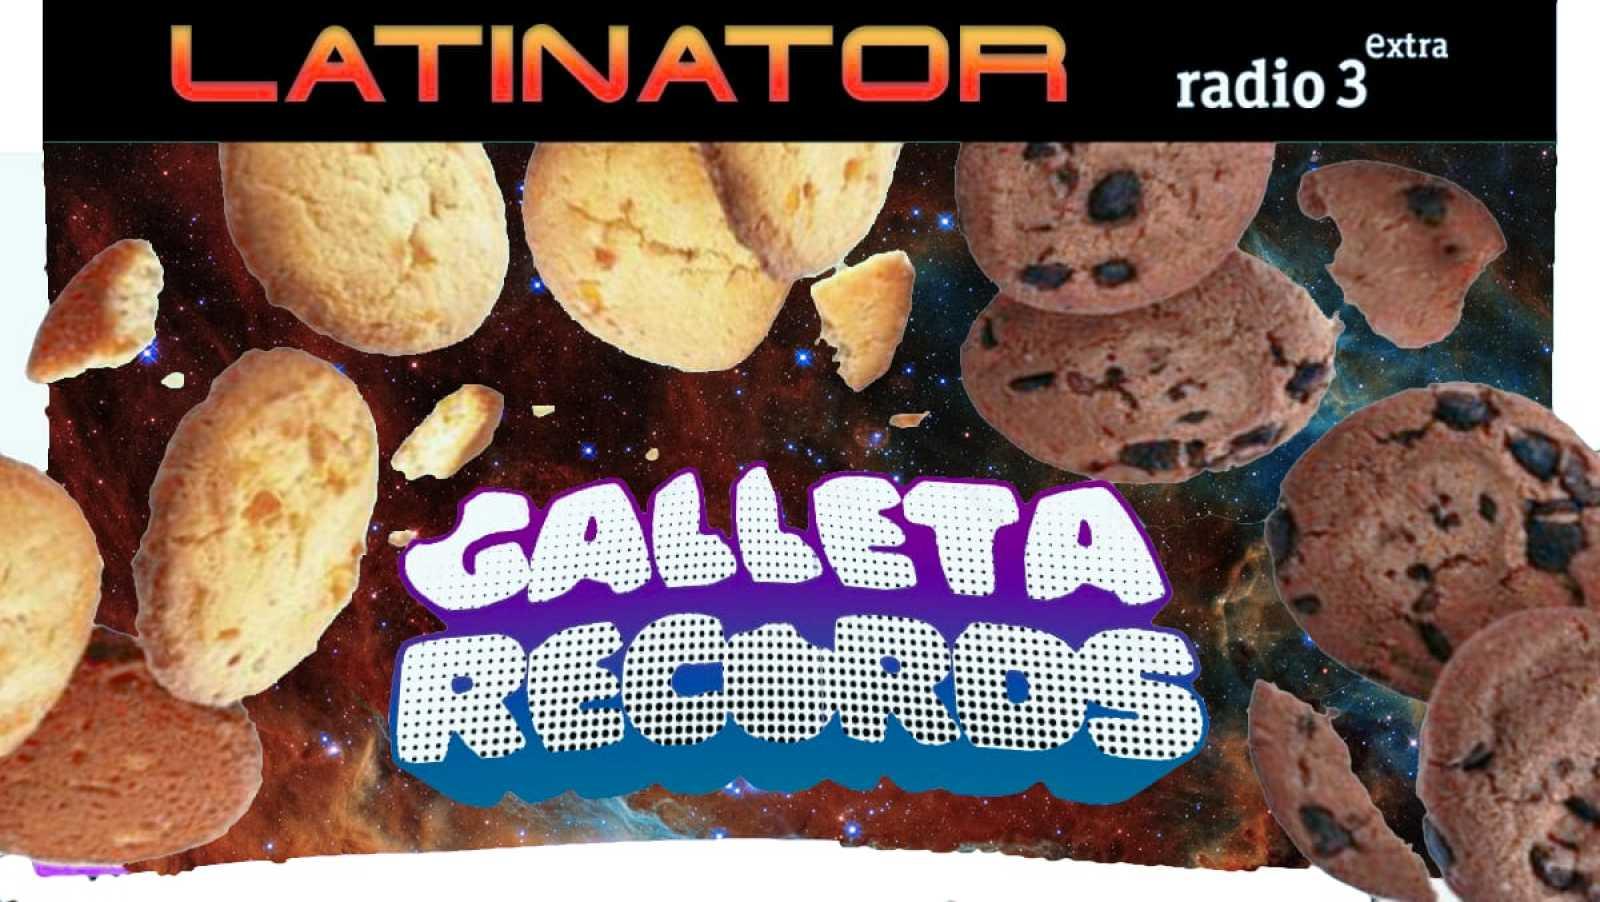 Latinator - GALLETA RECORDS - 11/06/20 - escuchar ahora